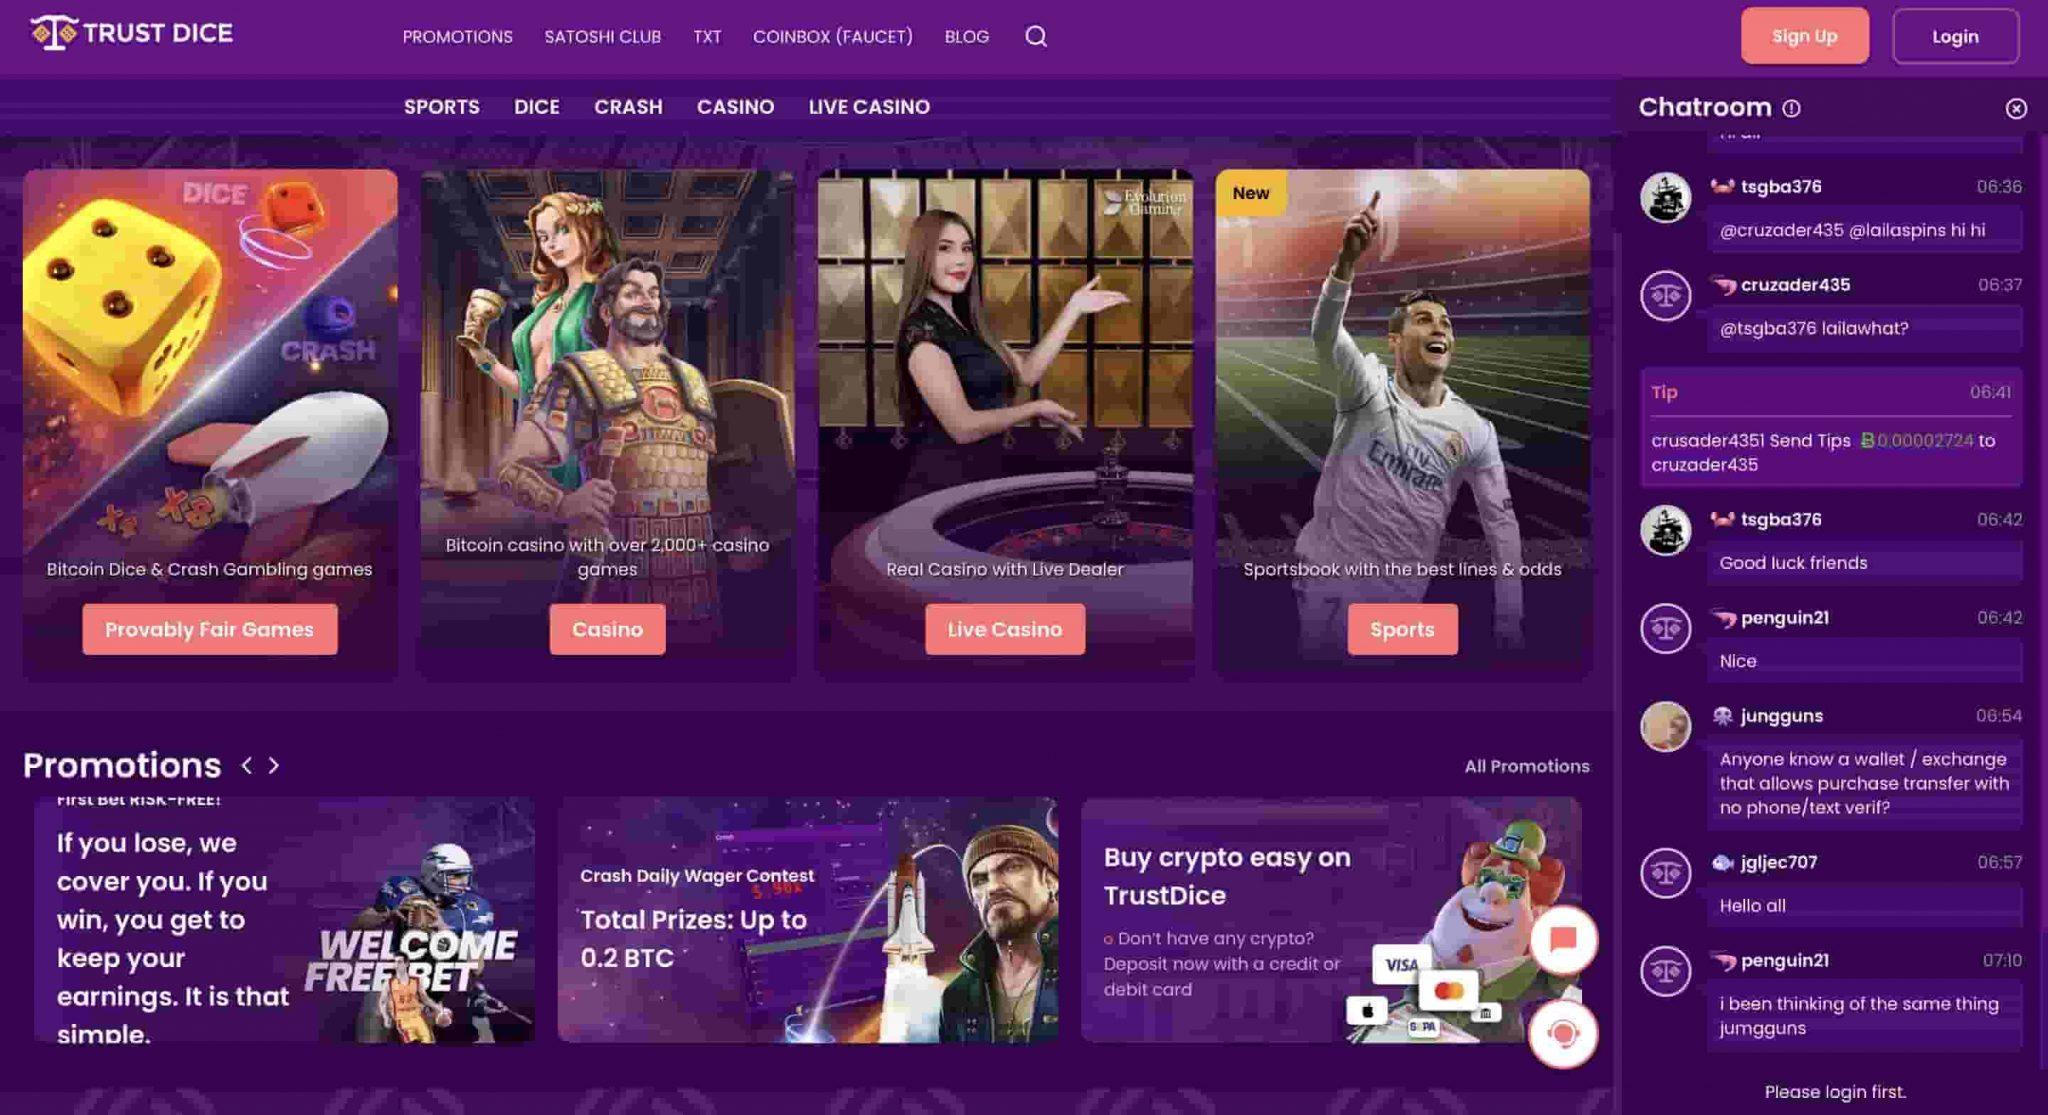 TrustDice Casino Review